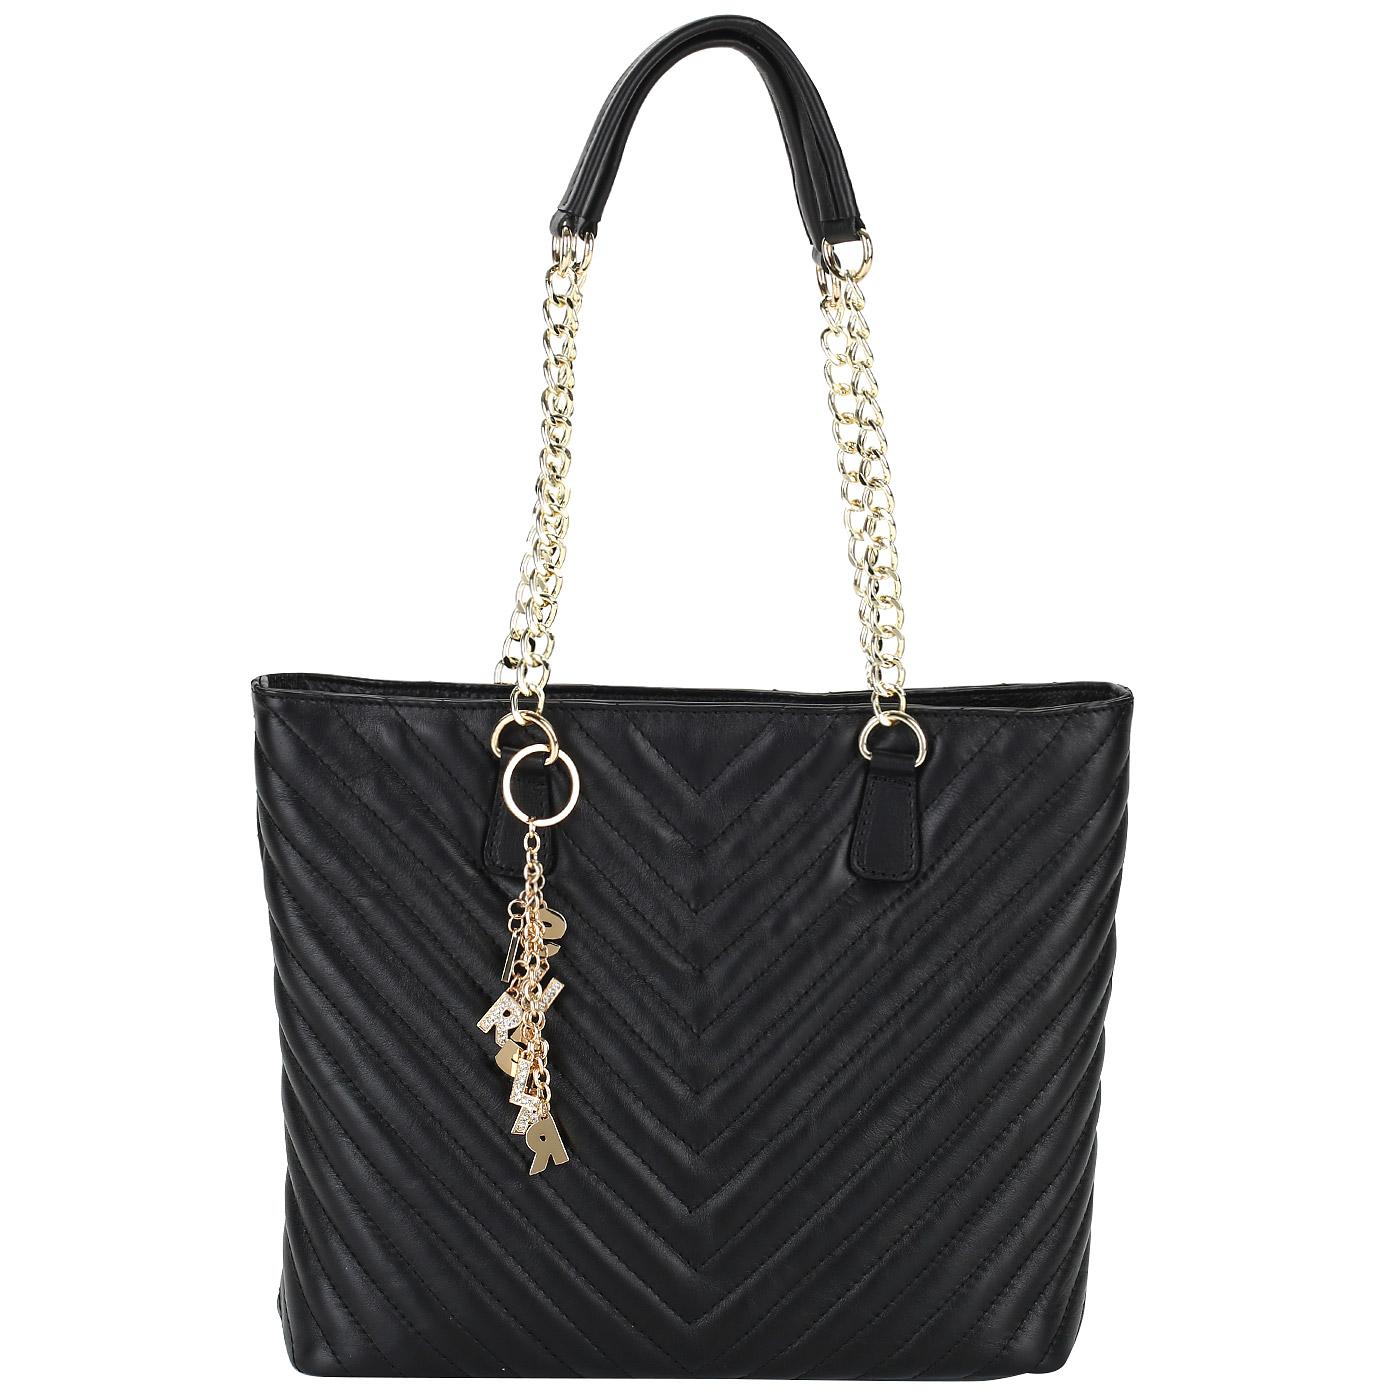 930b717ebd54 Женская стеганая сумка Sara Burglar Giola Женская стеганая сумка Sara  Burglar Giola ...